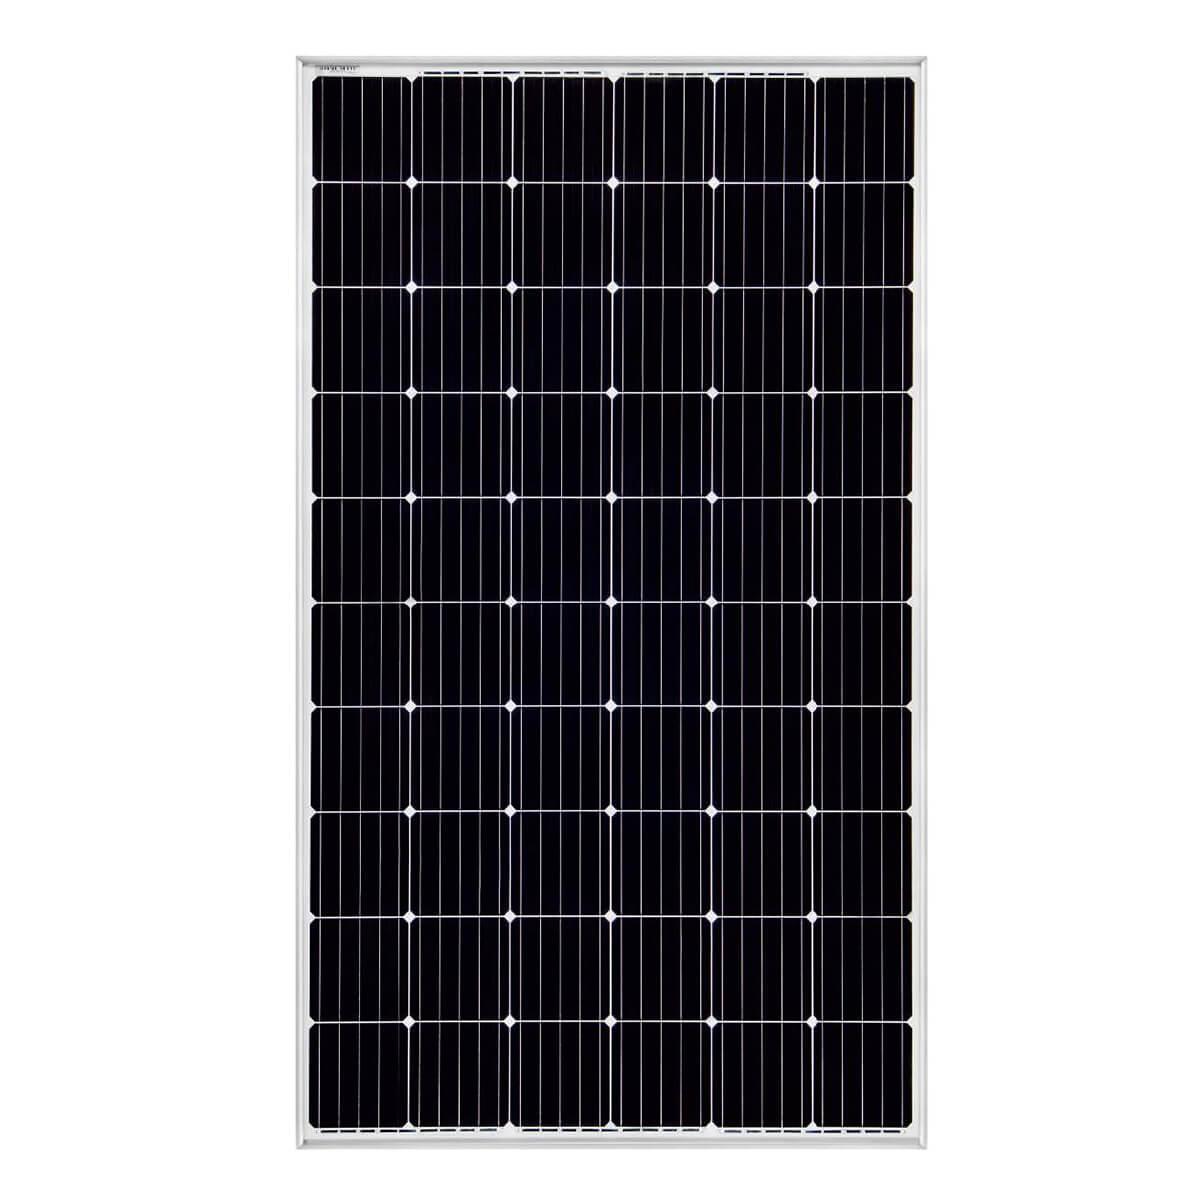 Odul solar 310W panel, odul solar 310Watt panel, Odul solar 310 W panel, odul solar 310 Watt panel, odul solar 310 Watt monokristal panel, Odul solar 310 W watt gunes paneli, odul solar 310 W watt monokristal gunes paneli, odul solar 310 W Watt fotovoltaik monokristal solar panel, odul solar 310W monokristal gunes enerjisi, odul solar OSMp60-310W panel, ÖDÜL SOLAR 310 WATT